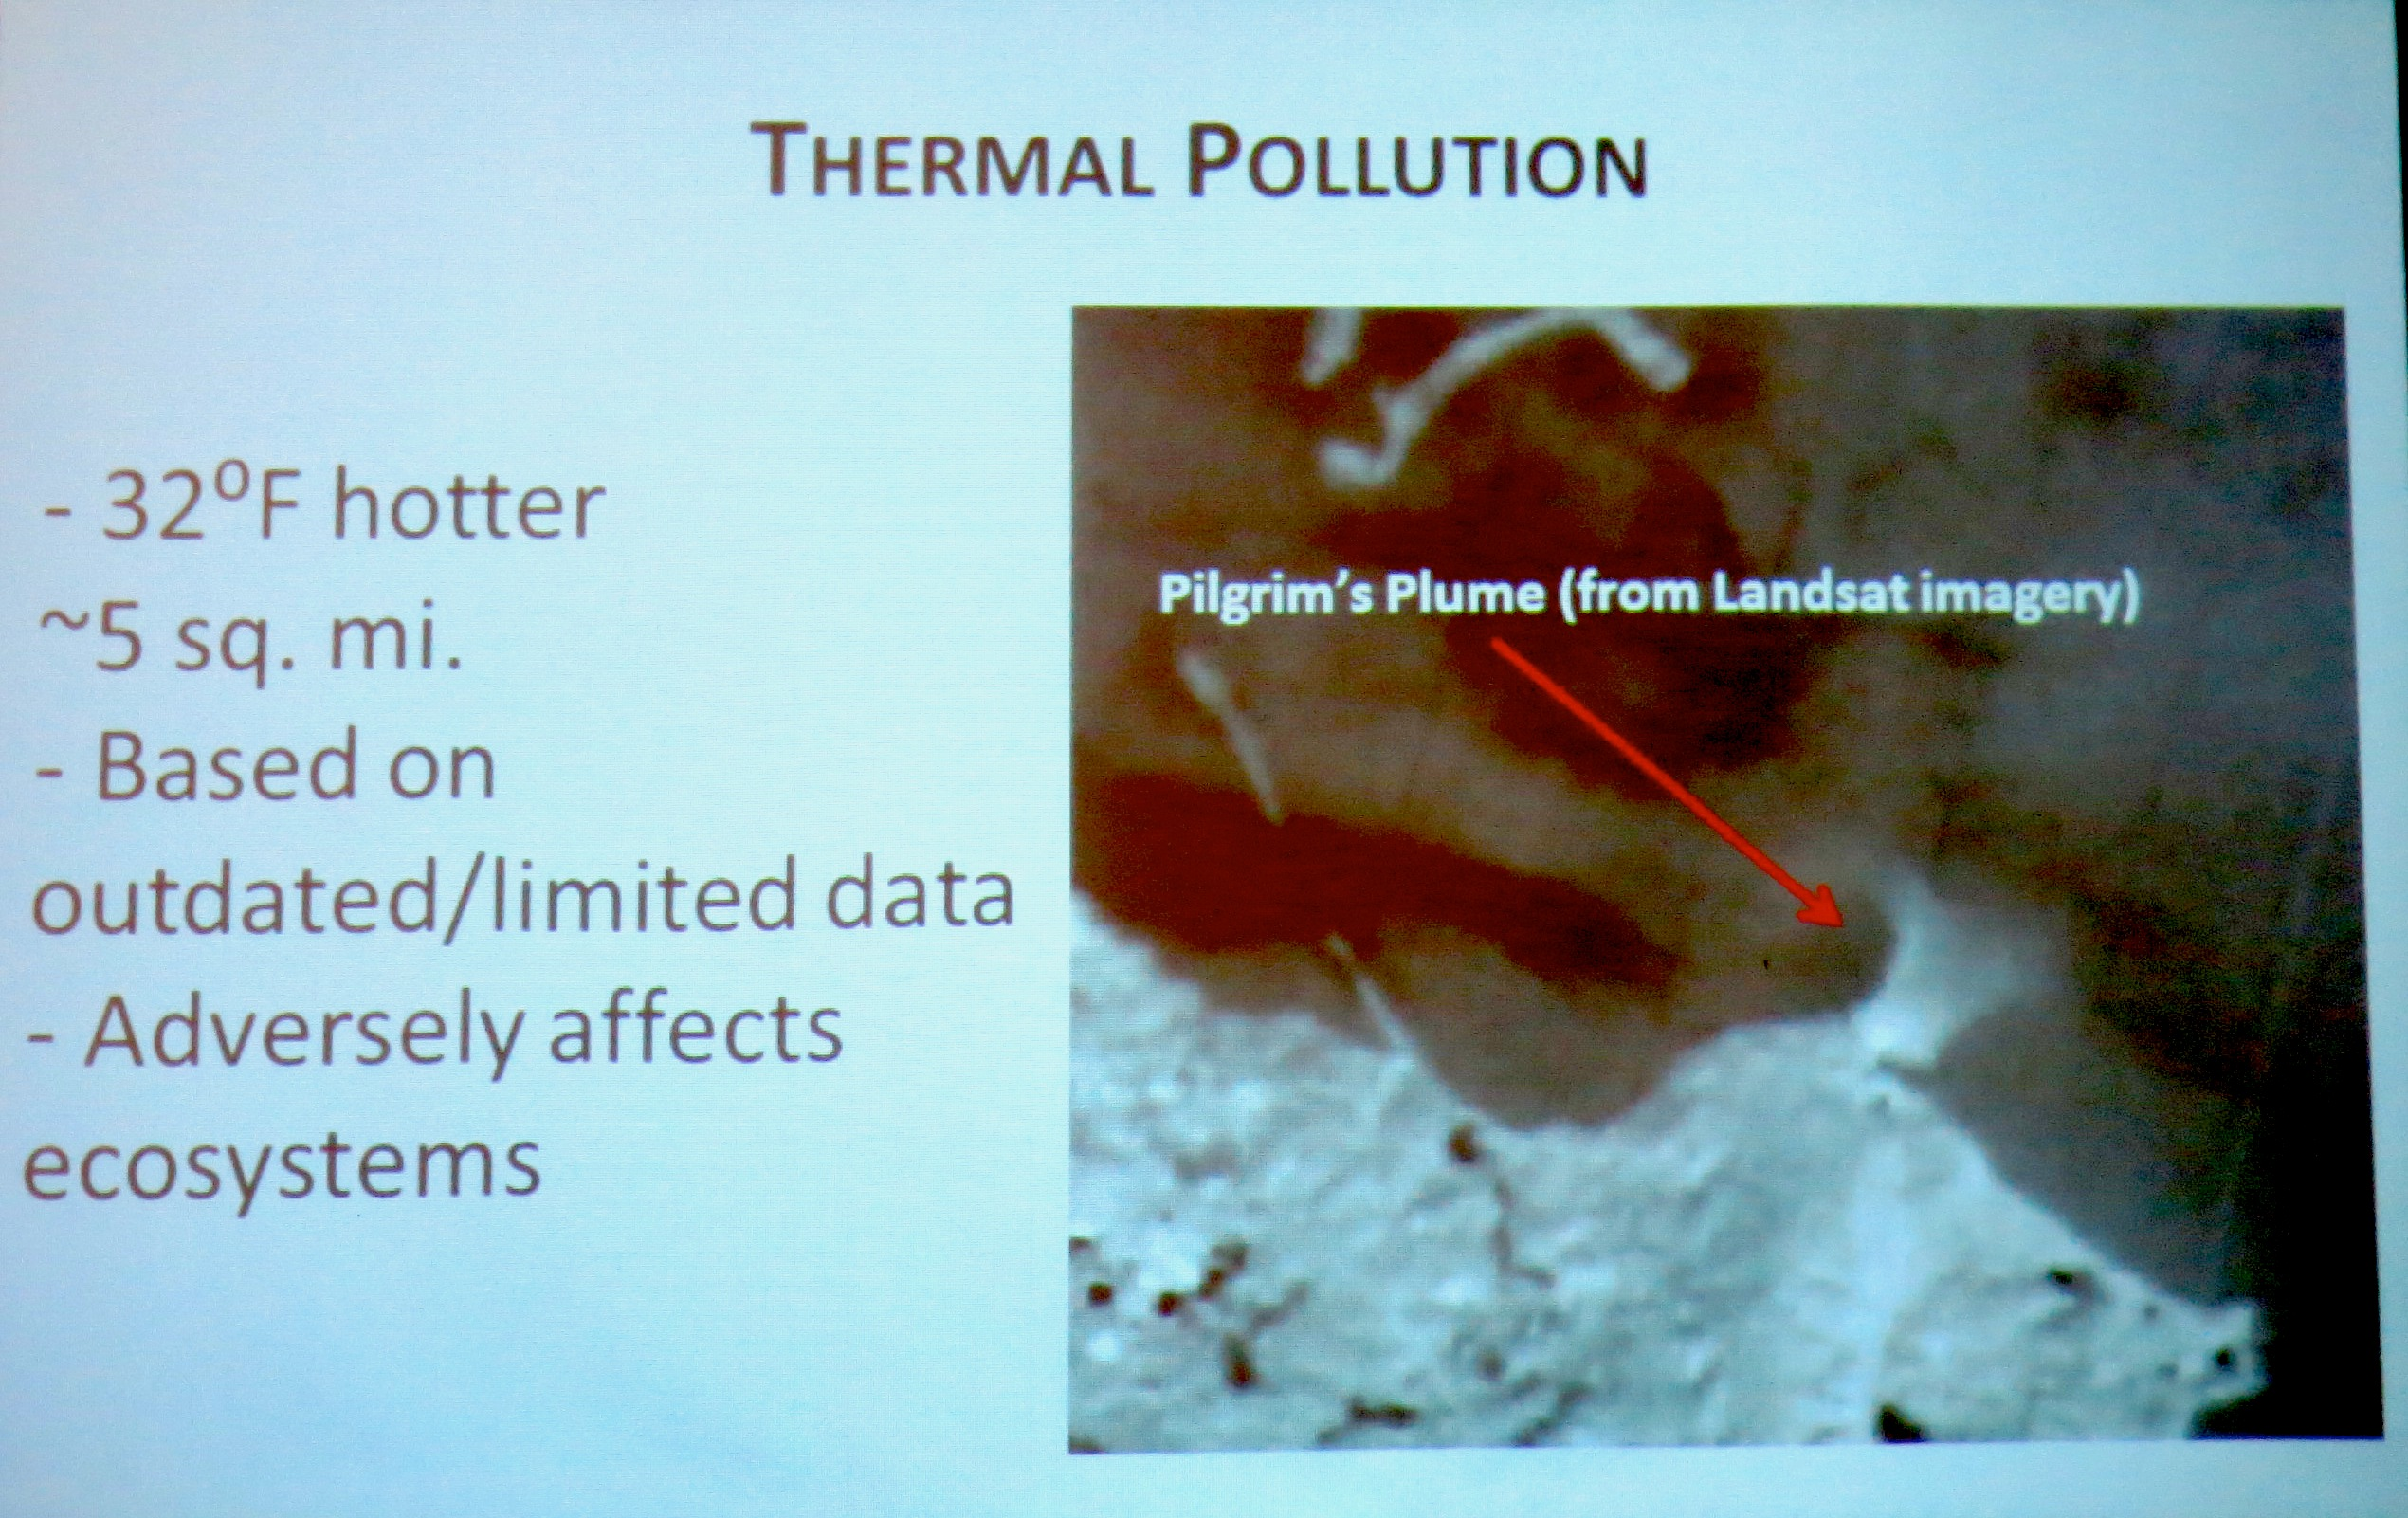 23_Cape_Cod_Bay_Watch_presentation_of_Pilgrim_Nuclear_Plant_flood_hazards_2 Cape Cod Bay Water Temperature